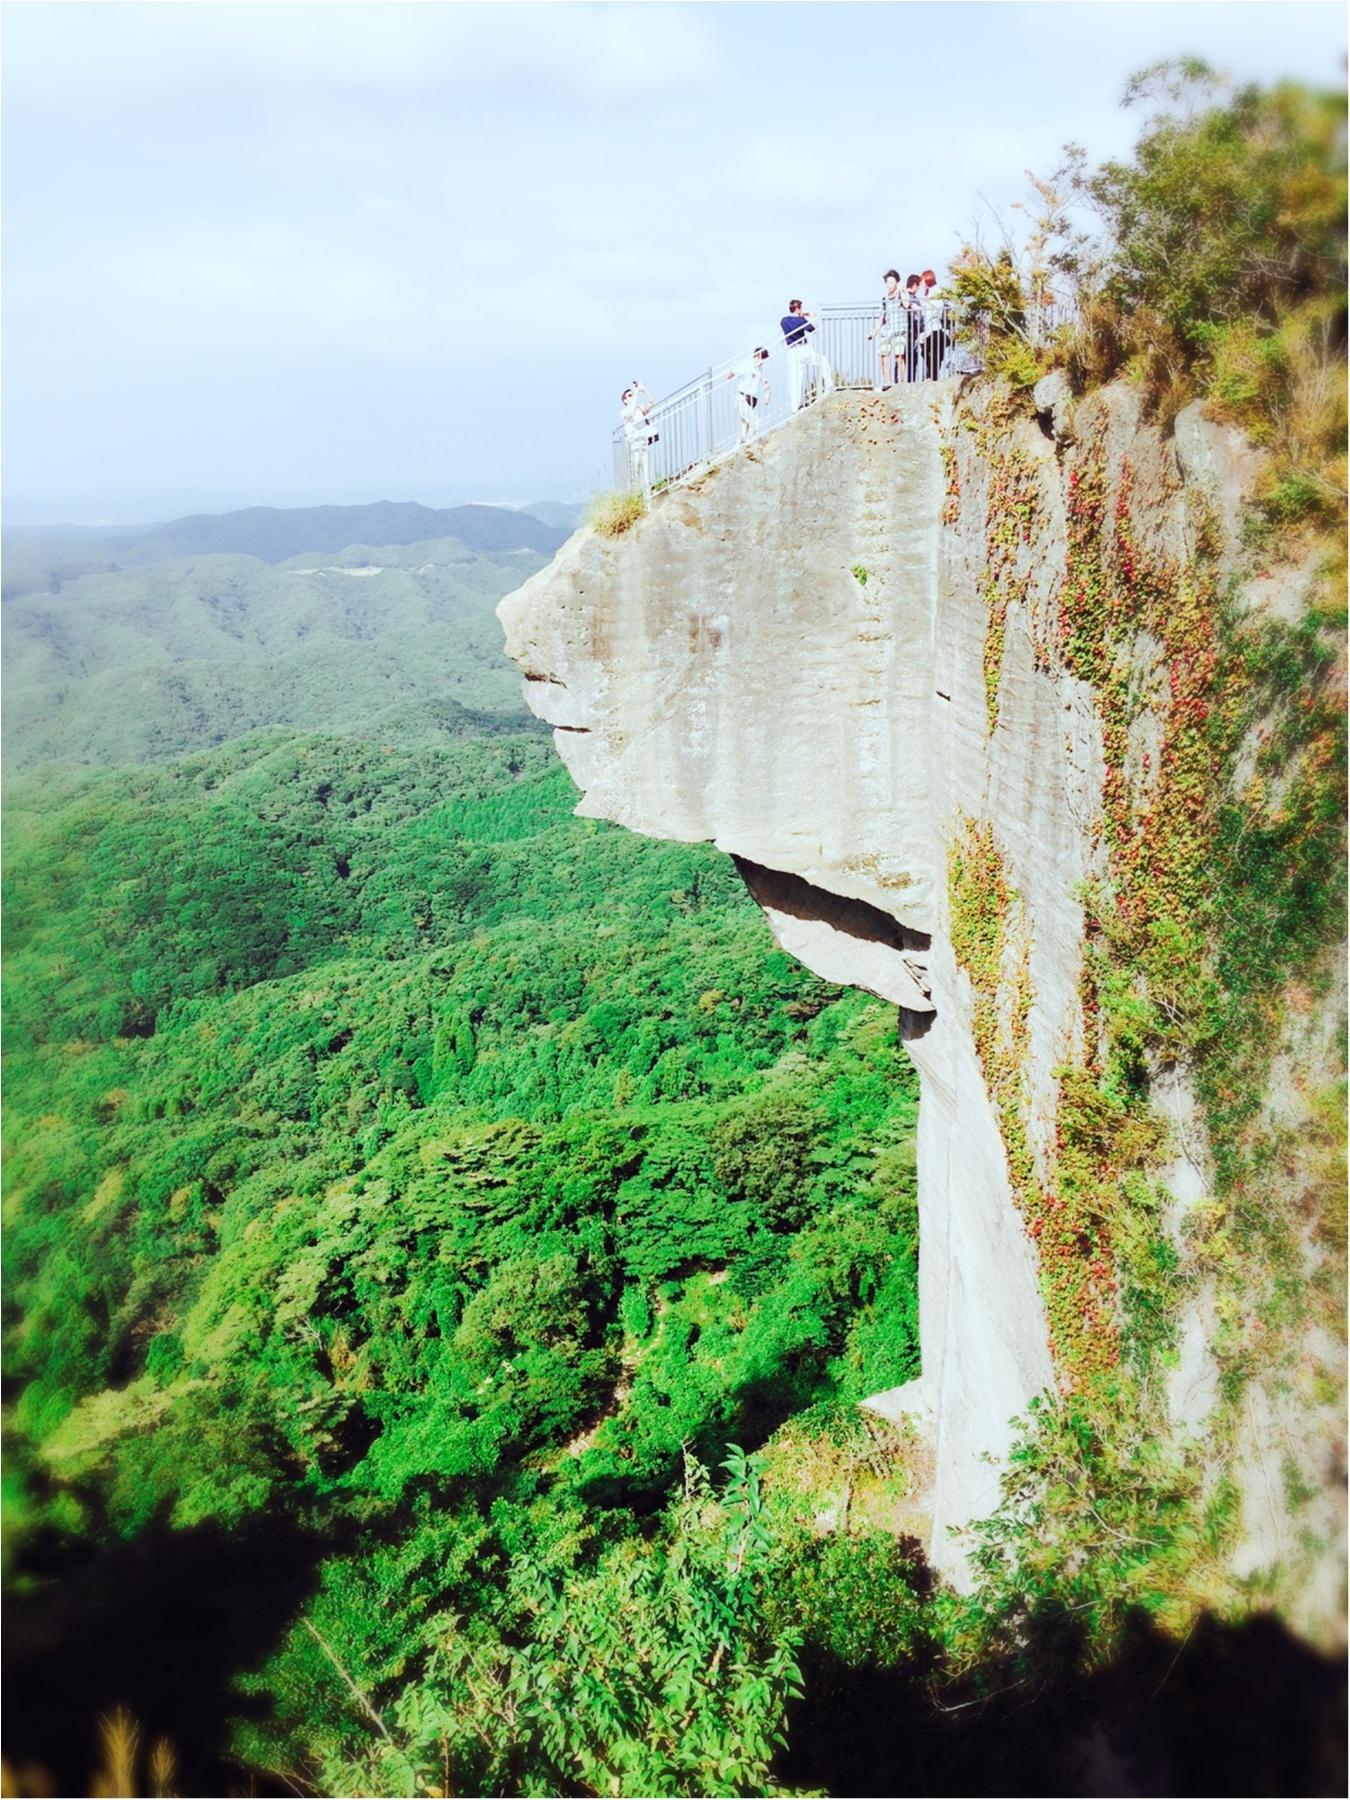 …ஐ 【都心から1時間TRIP】鋸山でスリリングな自然を堪能しよう** ੈ✩‧ ஐ¨_5